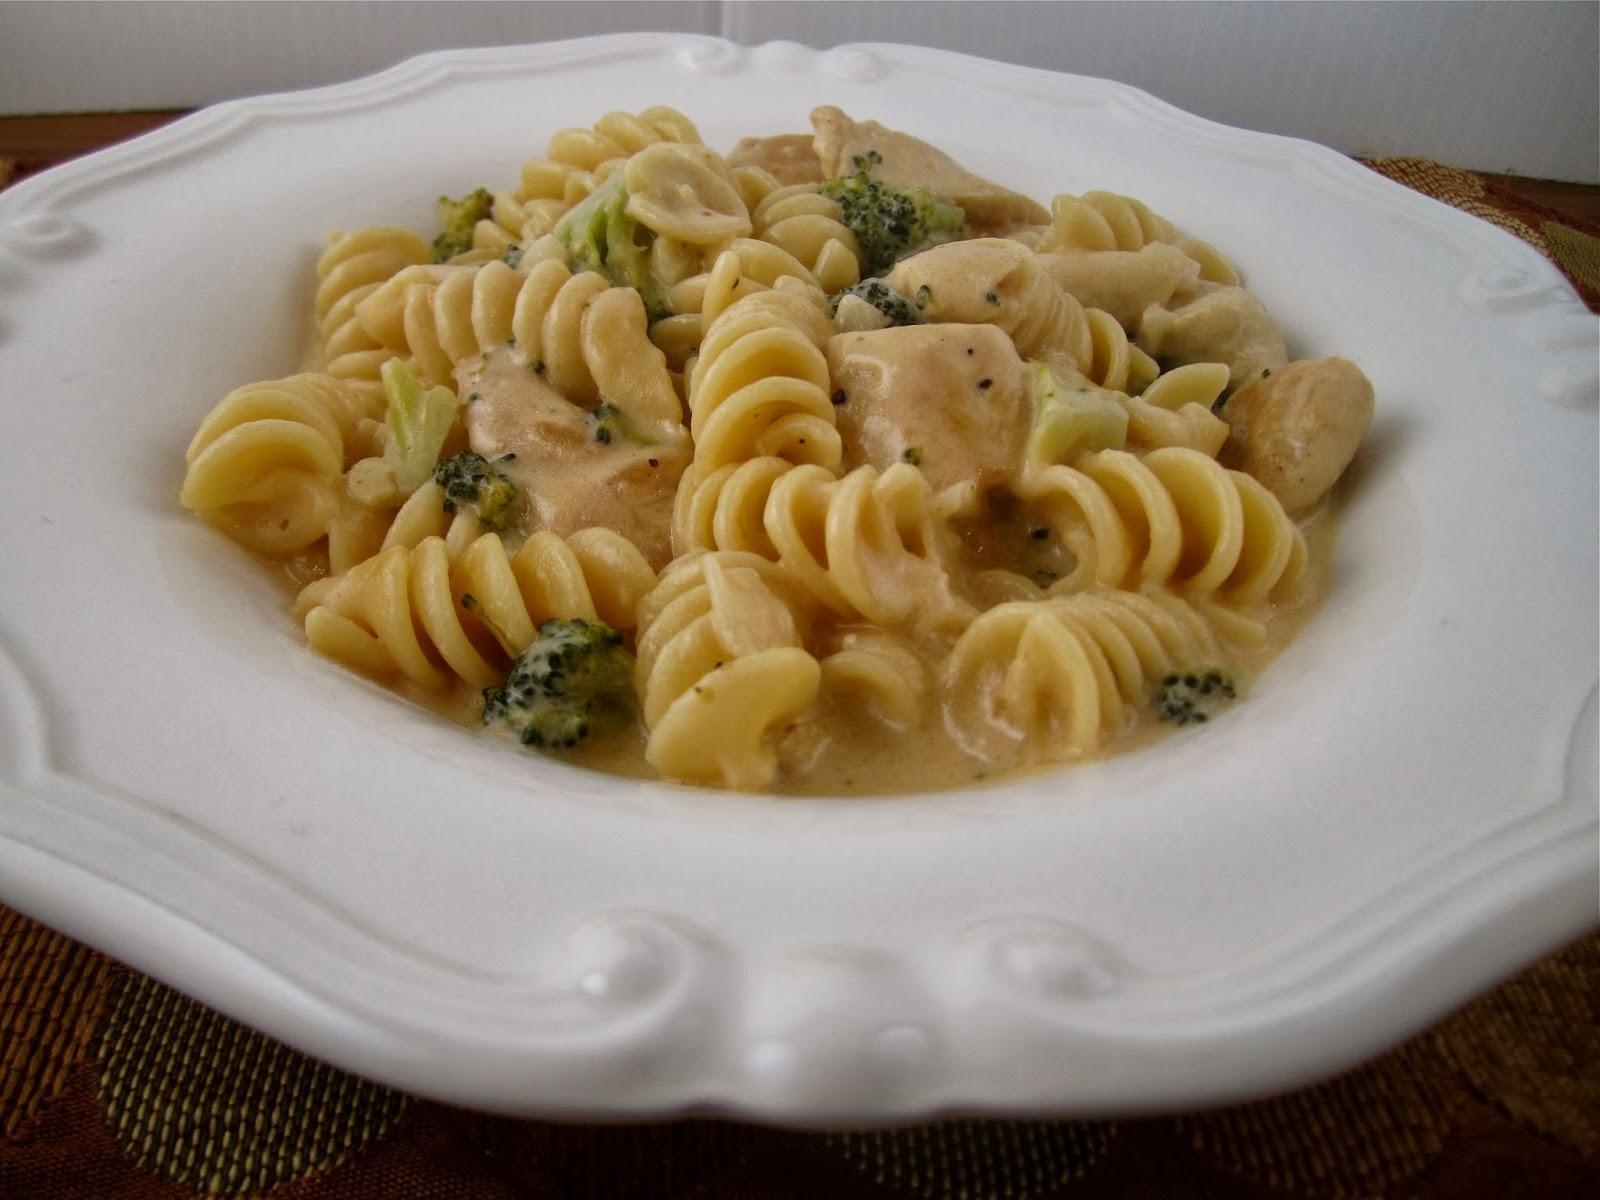 Chicken Cheddar Broccoli Pasta